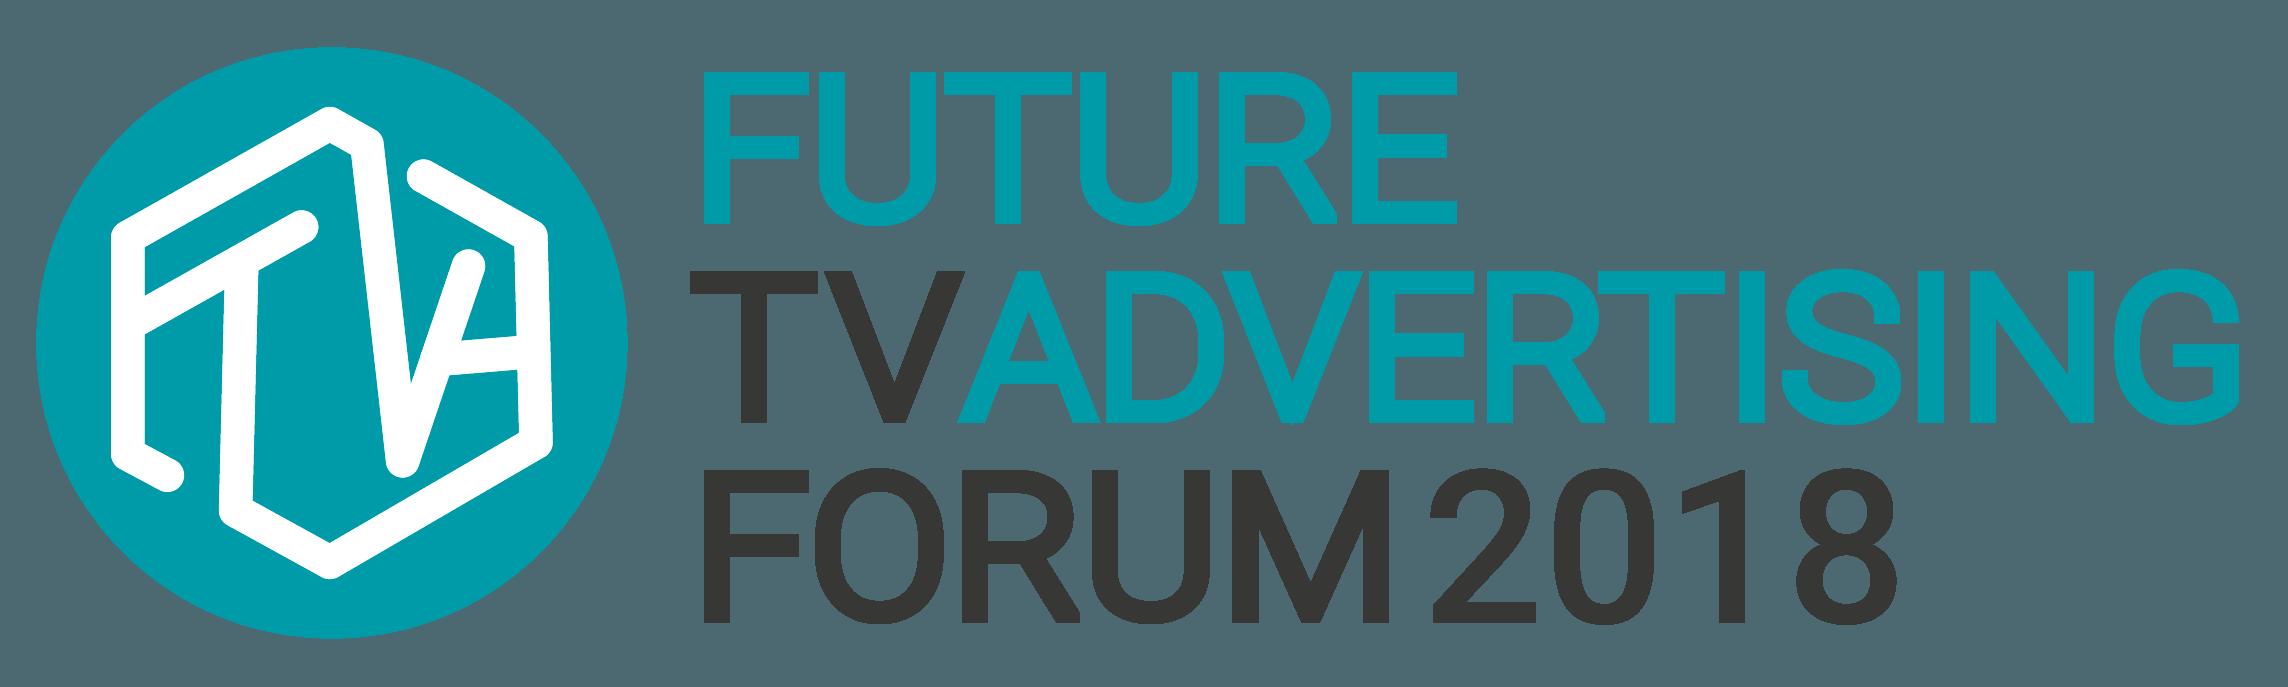 FutureTVAdvertisingLondon_2018